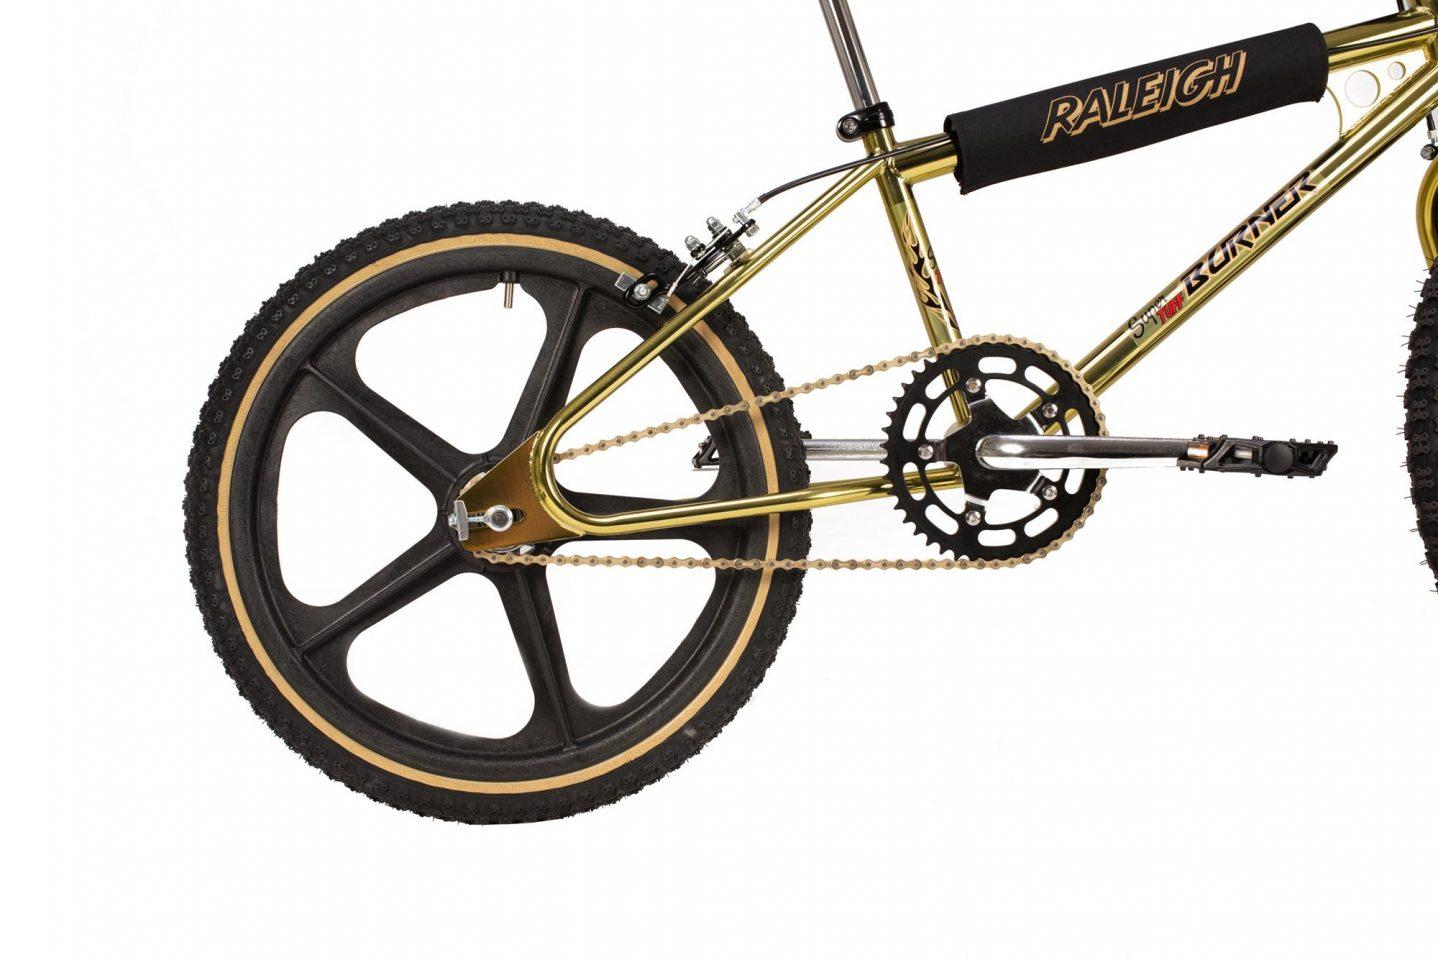 Raleigh Super Tuff Burner bmx loop tail